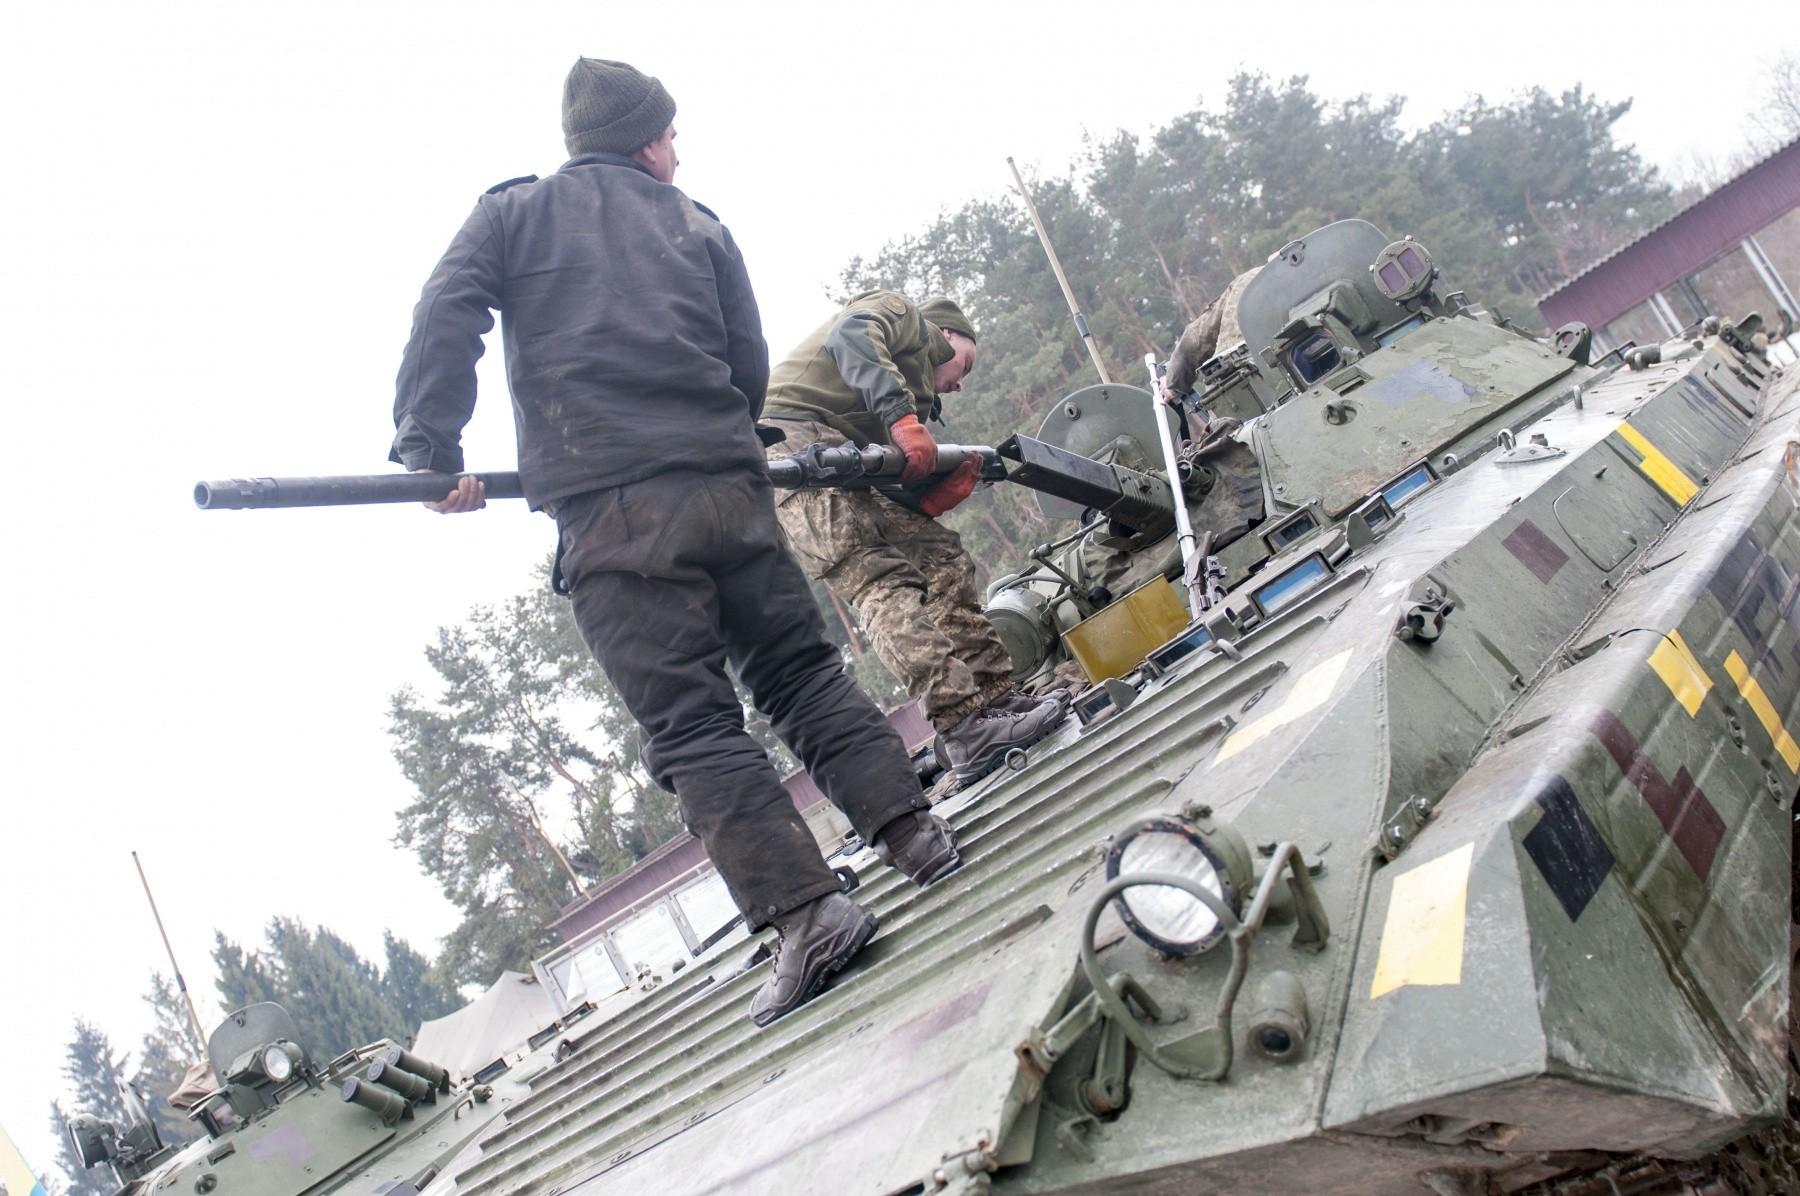 https://www.army.mil/e2/c/images/2017/02/26/467602/original.jpg